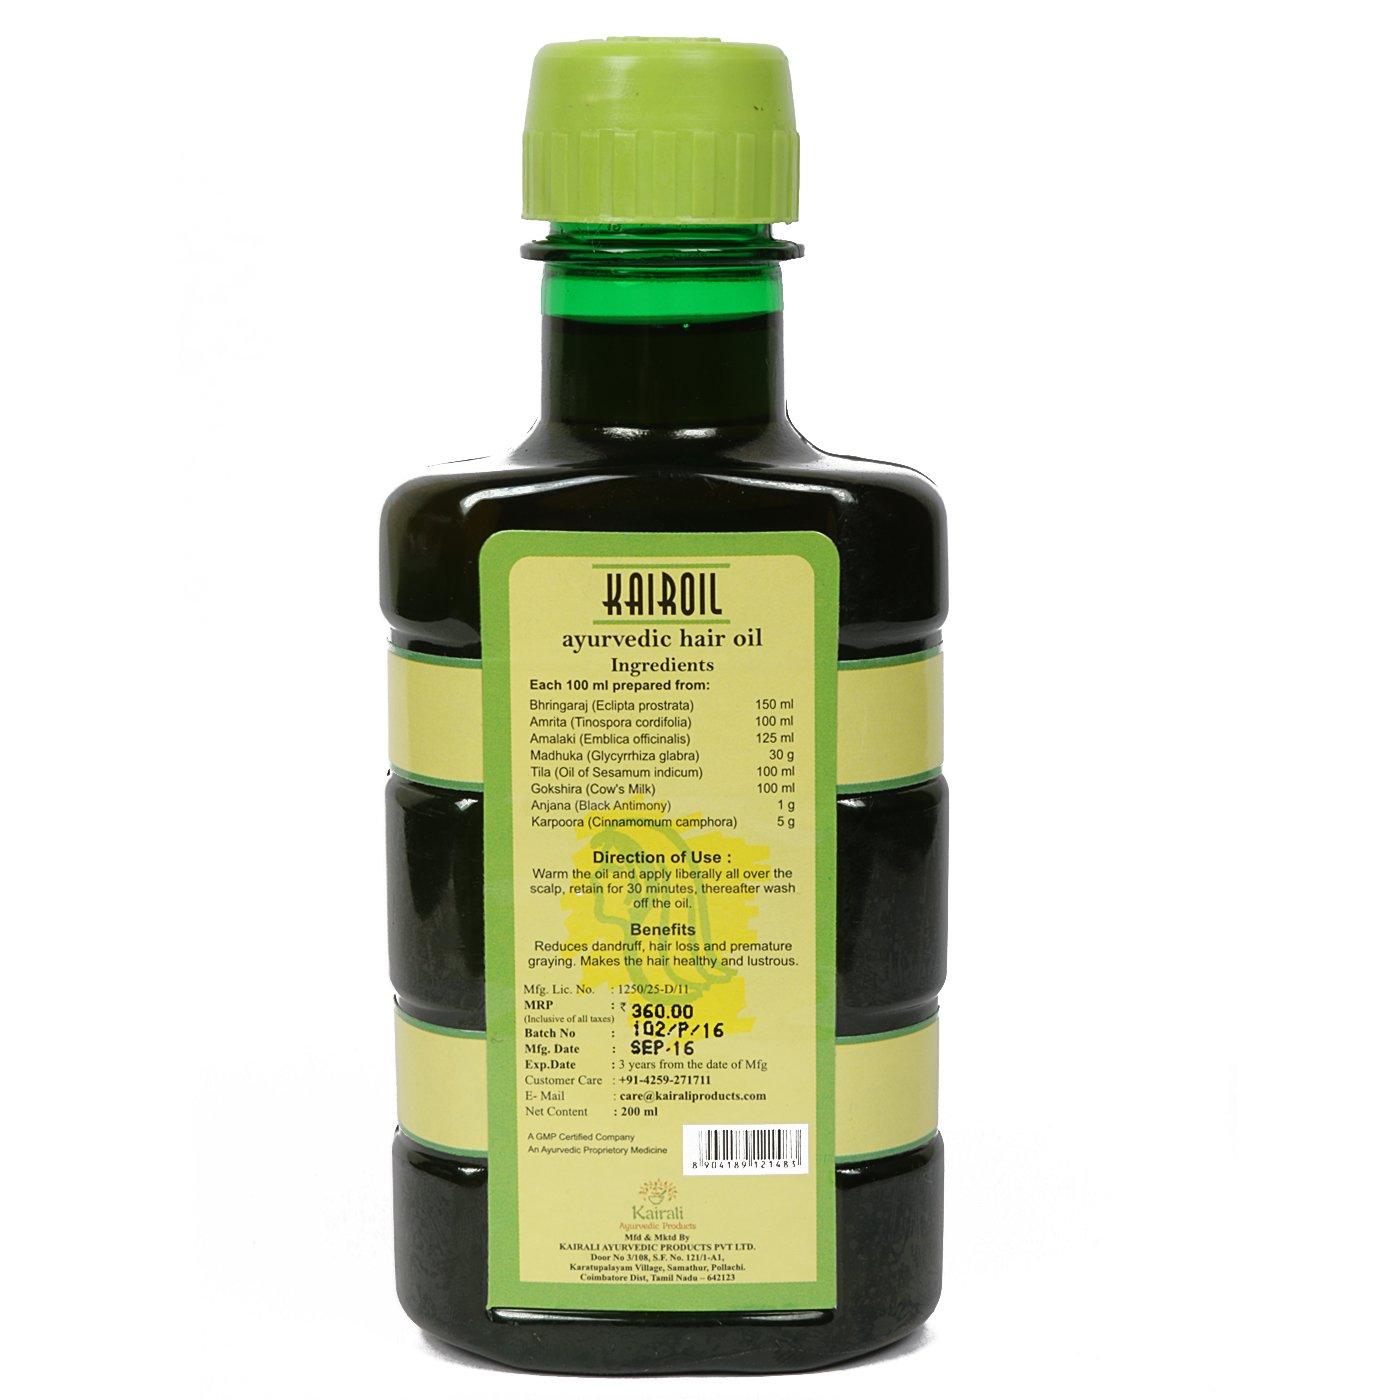 Kairali - Kairoil  (Kairali's Ayurvedic Hair oil)